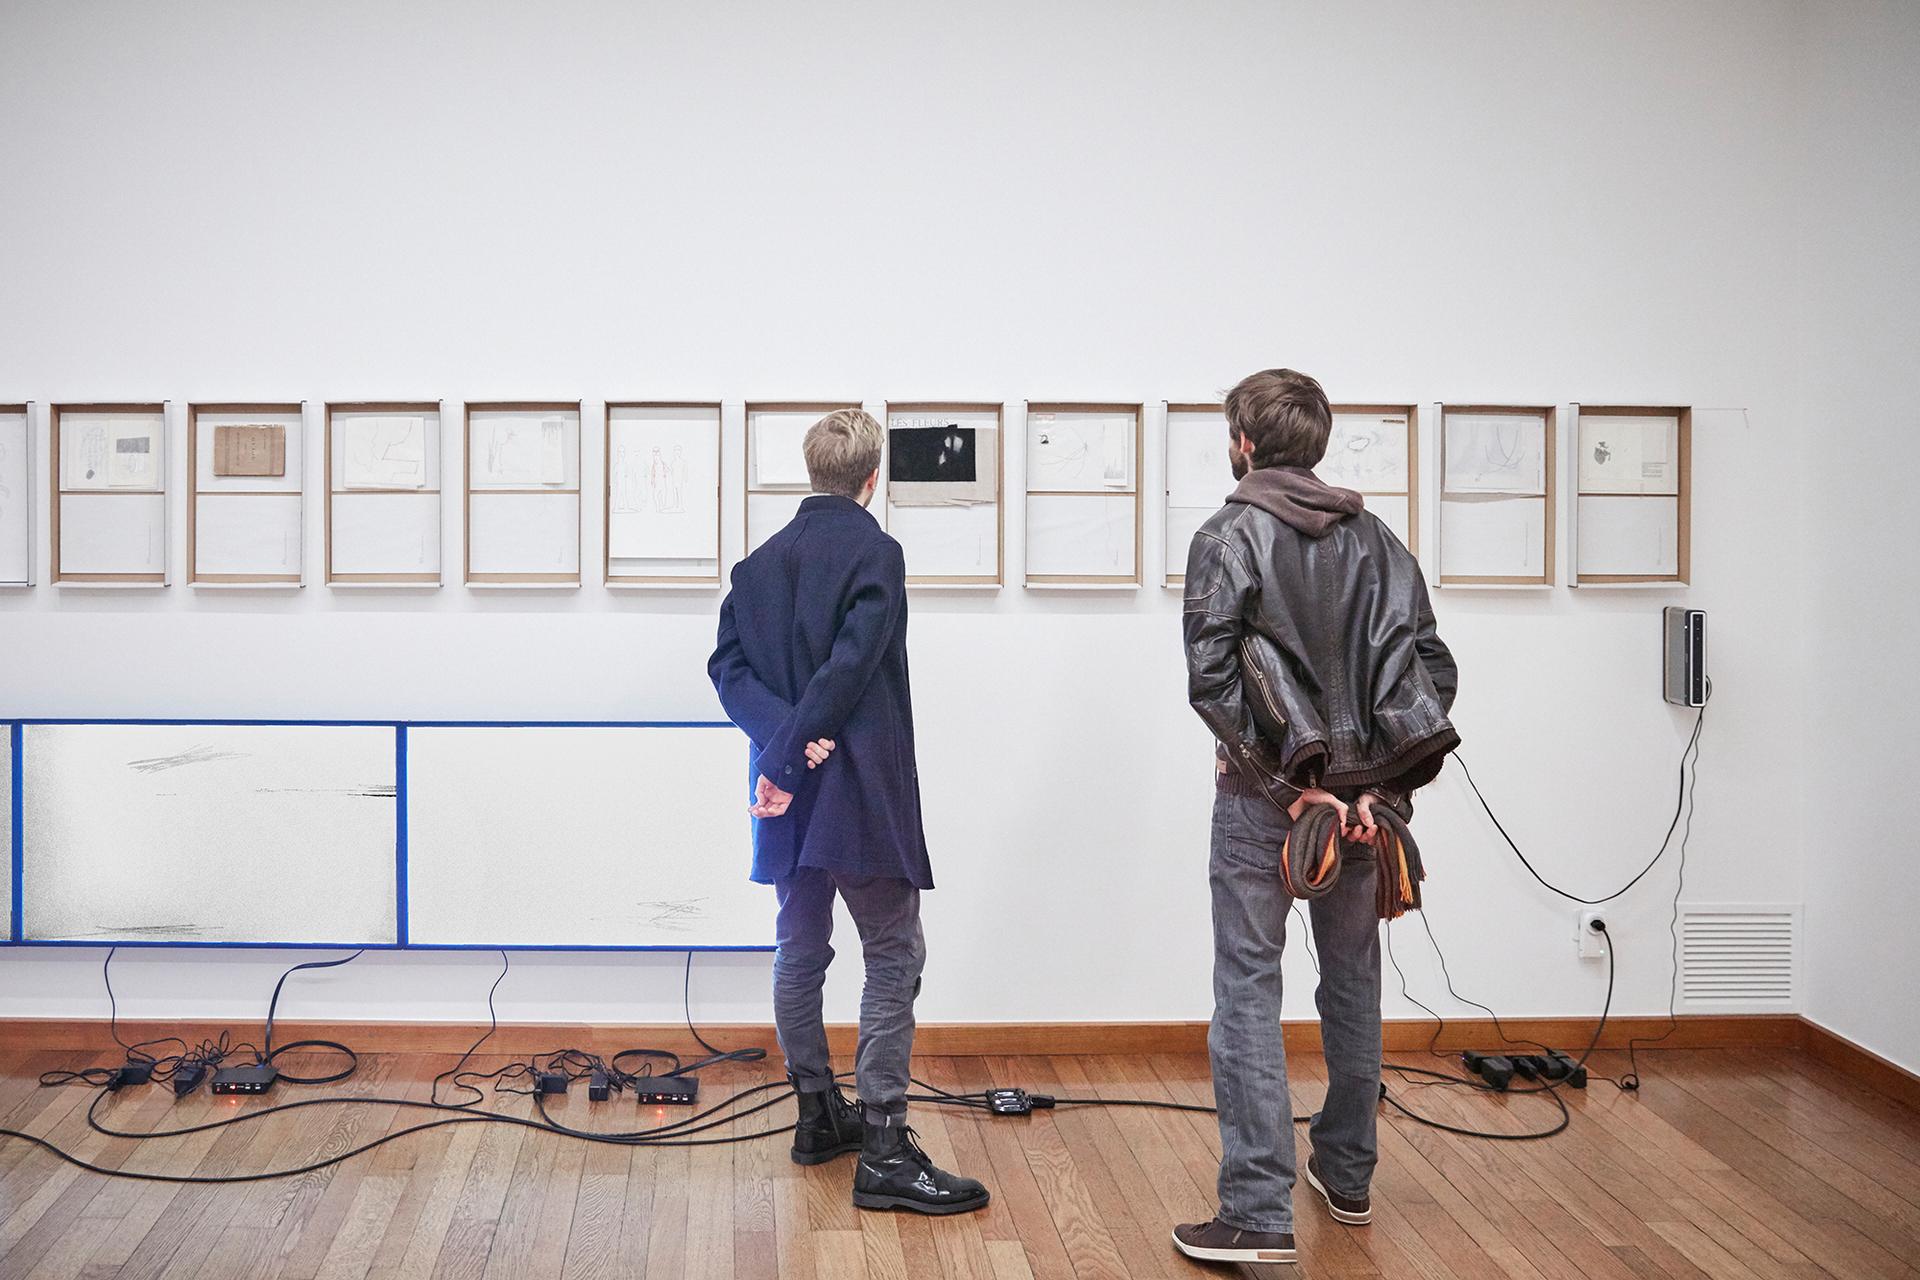 Installationsansicht der Ausstellung «Catharina van Eetvled / ILK», Foto: Kunstmuseum Basel, Julian Salinas